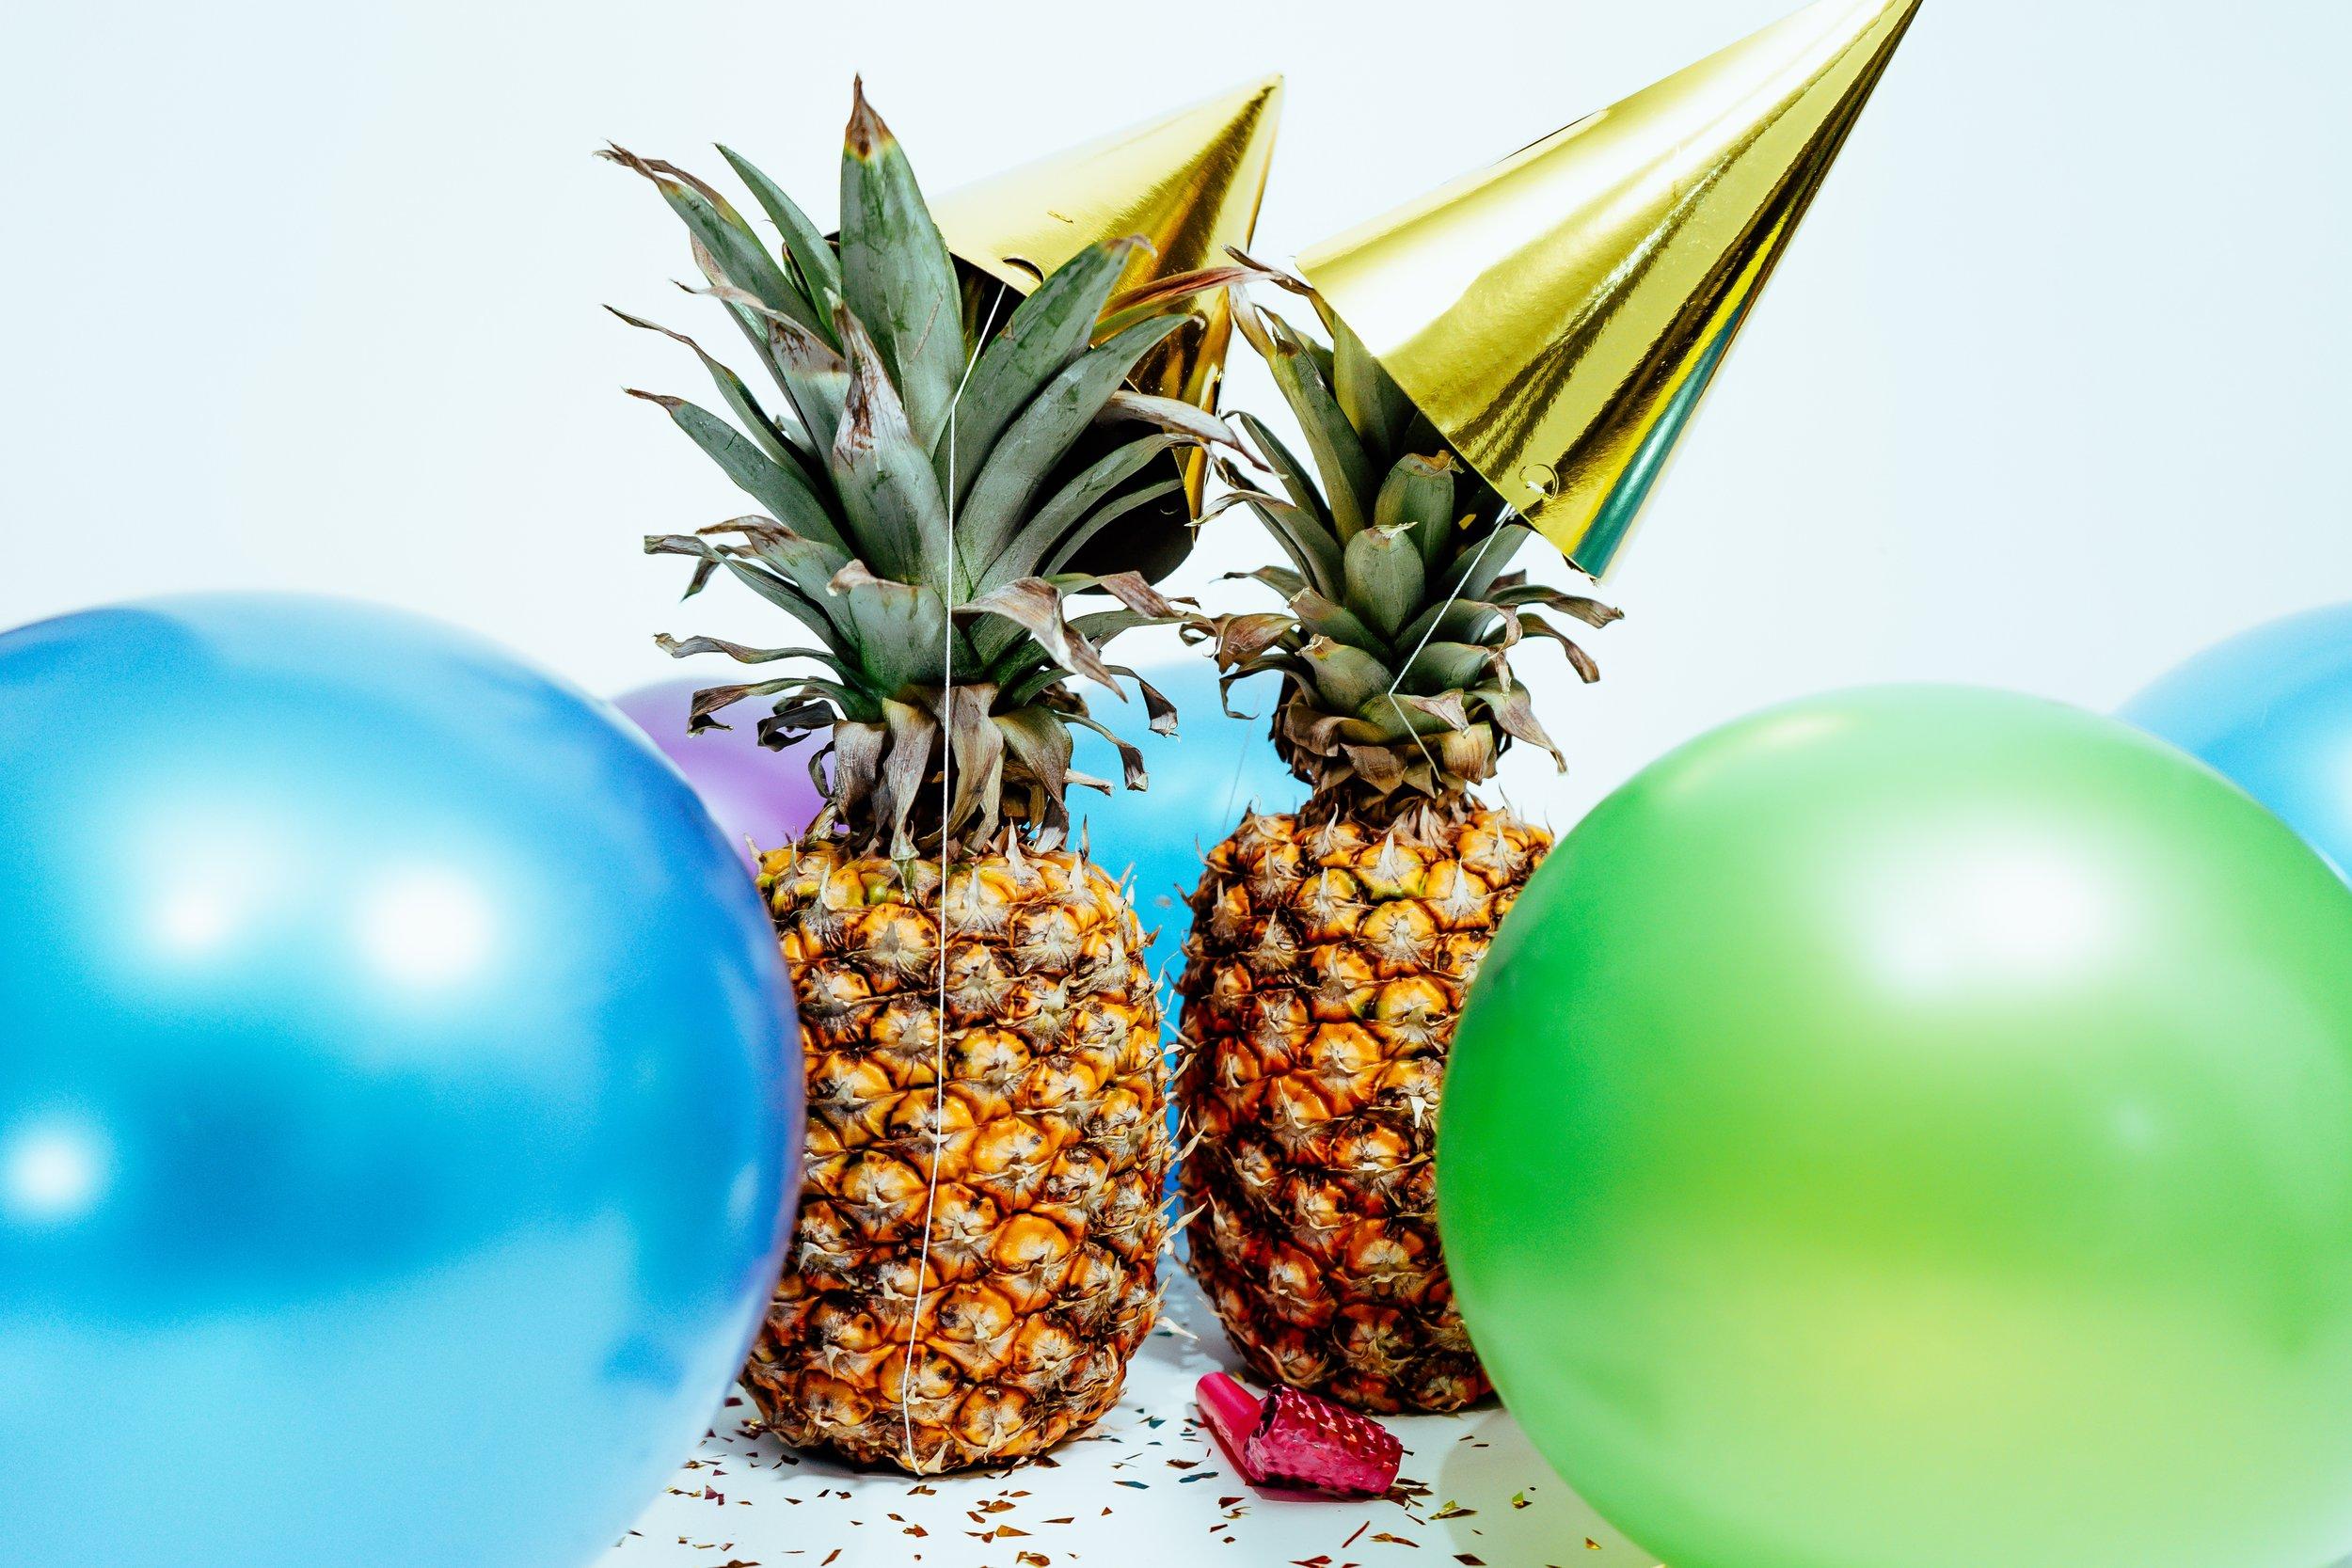 pineapple-supply-co-285389-unsplash.jpg